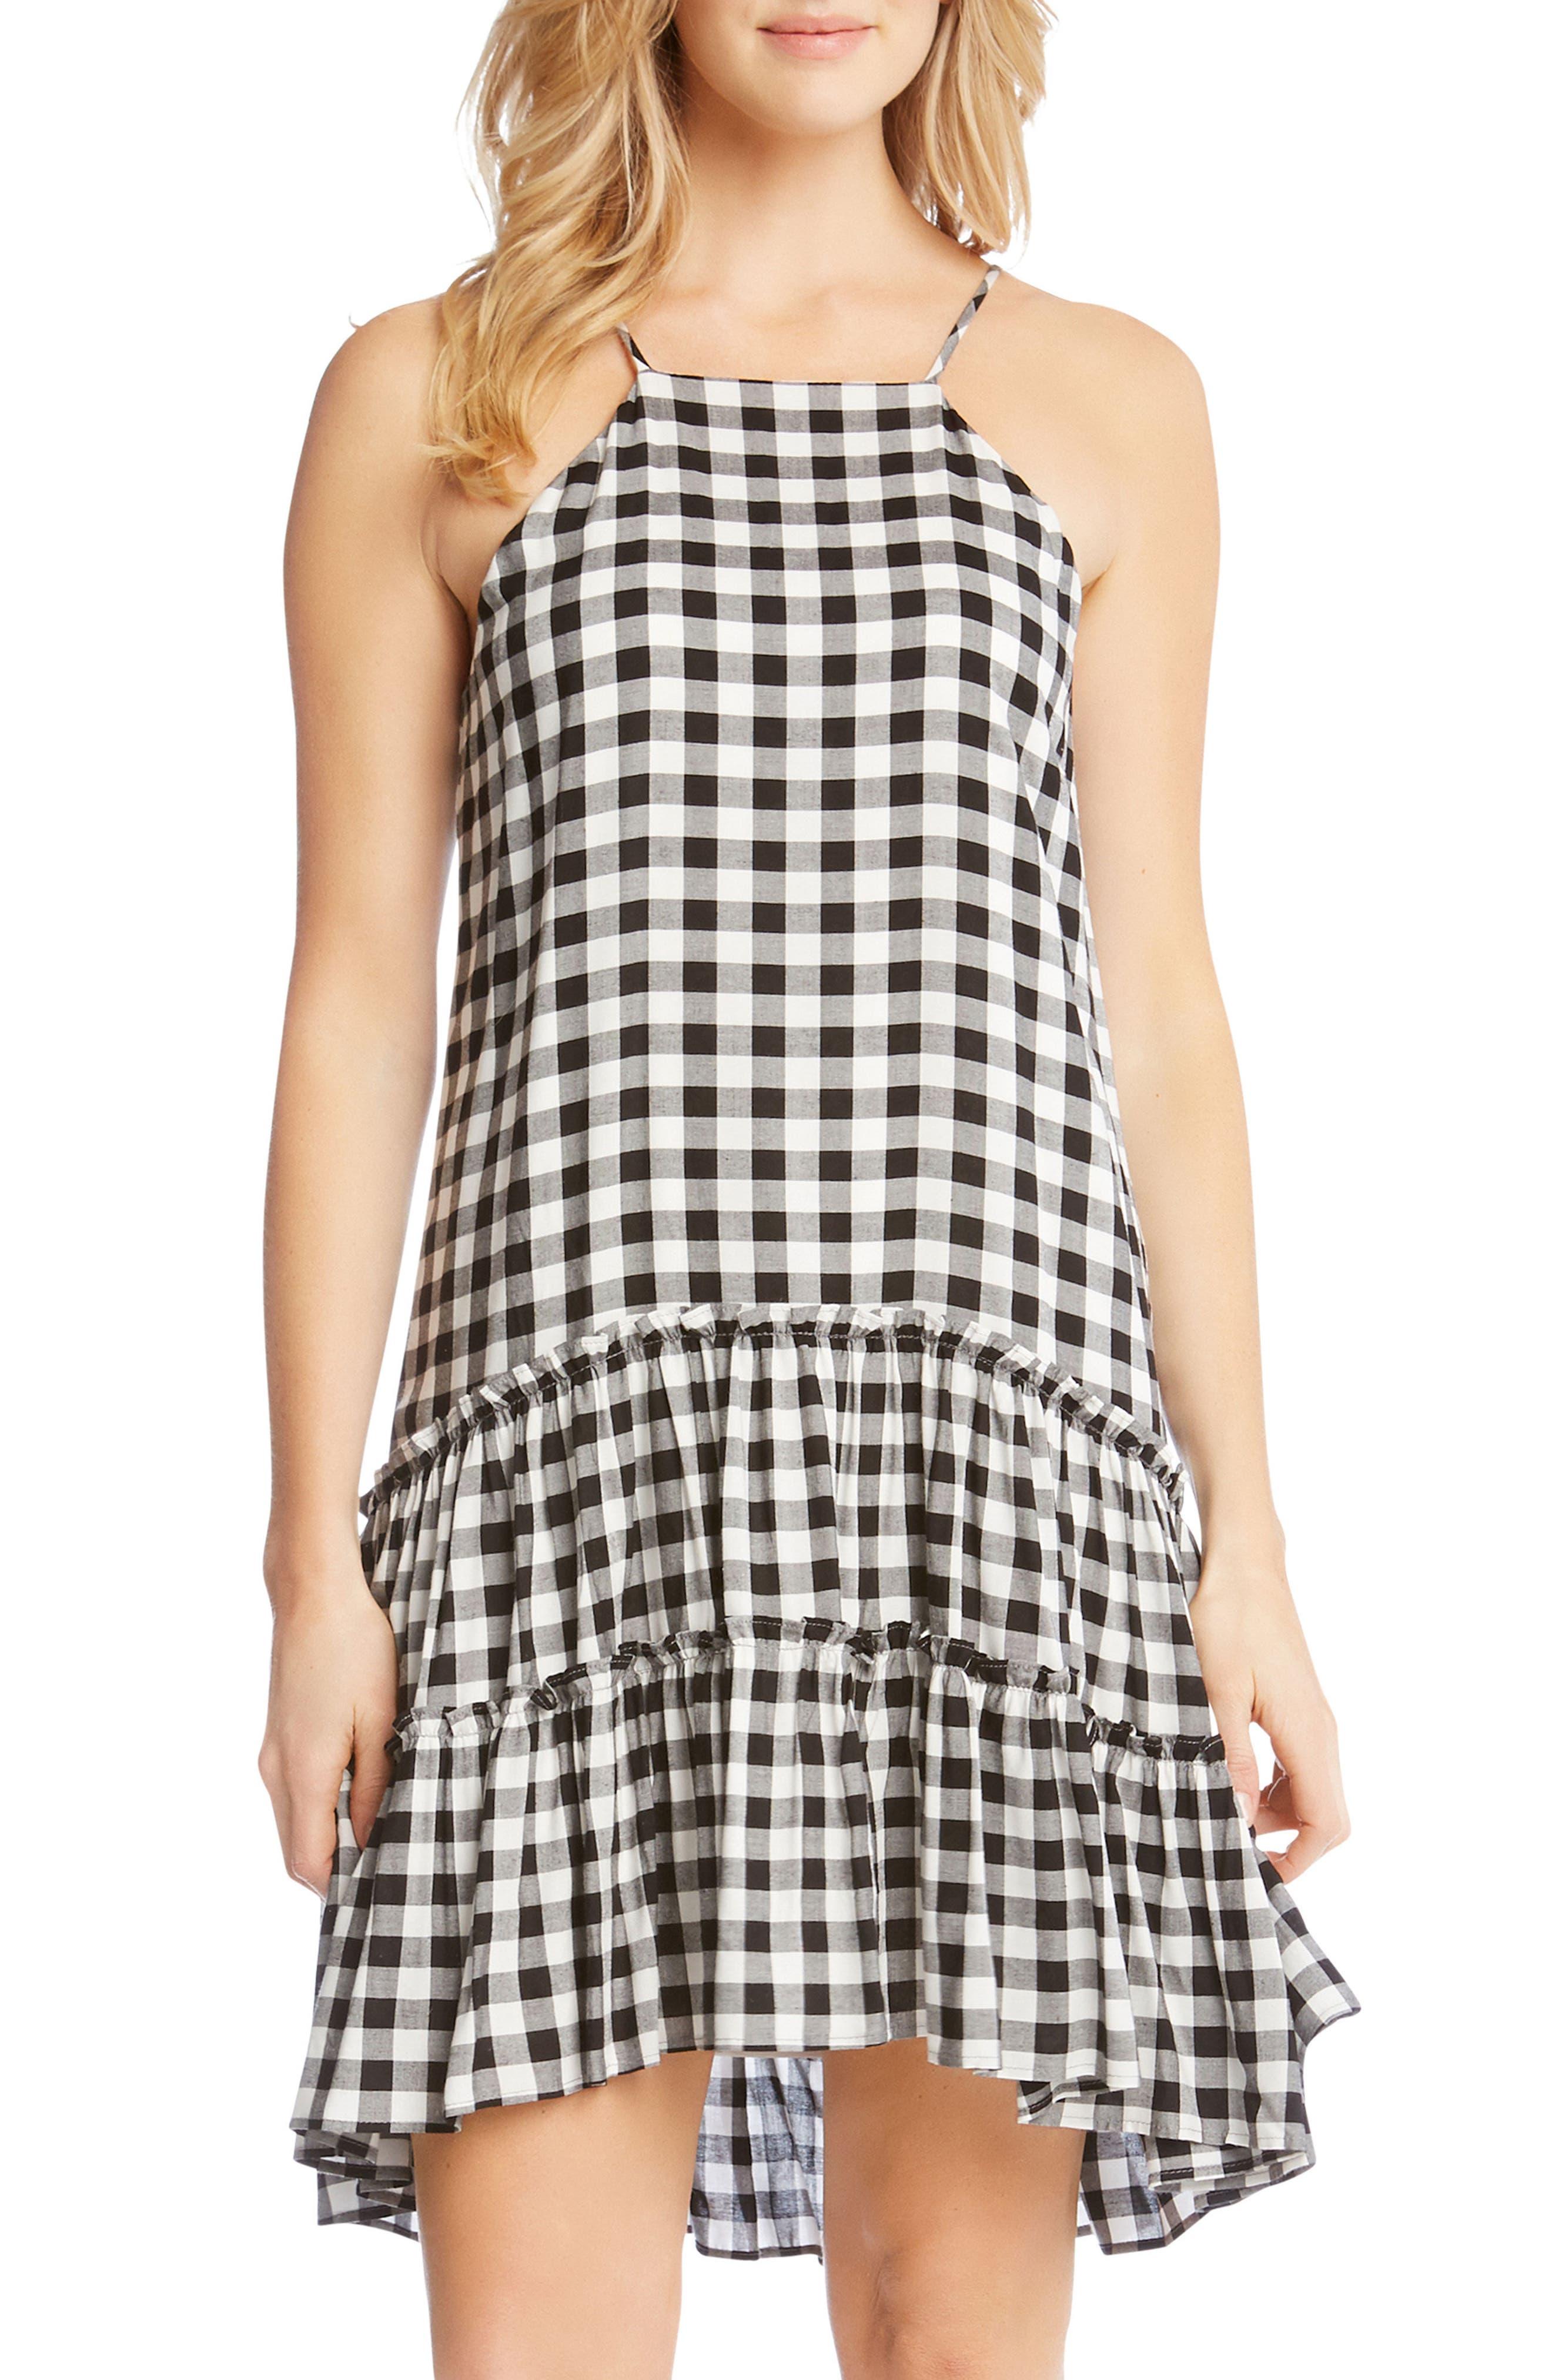 Gingham Ruffle Hem Halter Top Dress,                             Alternate thumbnail 4, color,                             Check